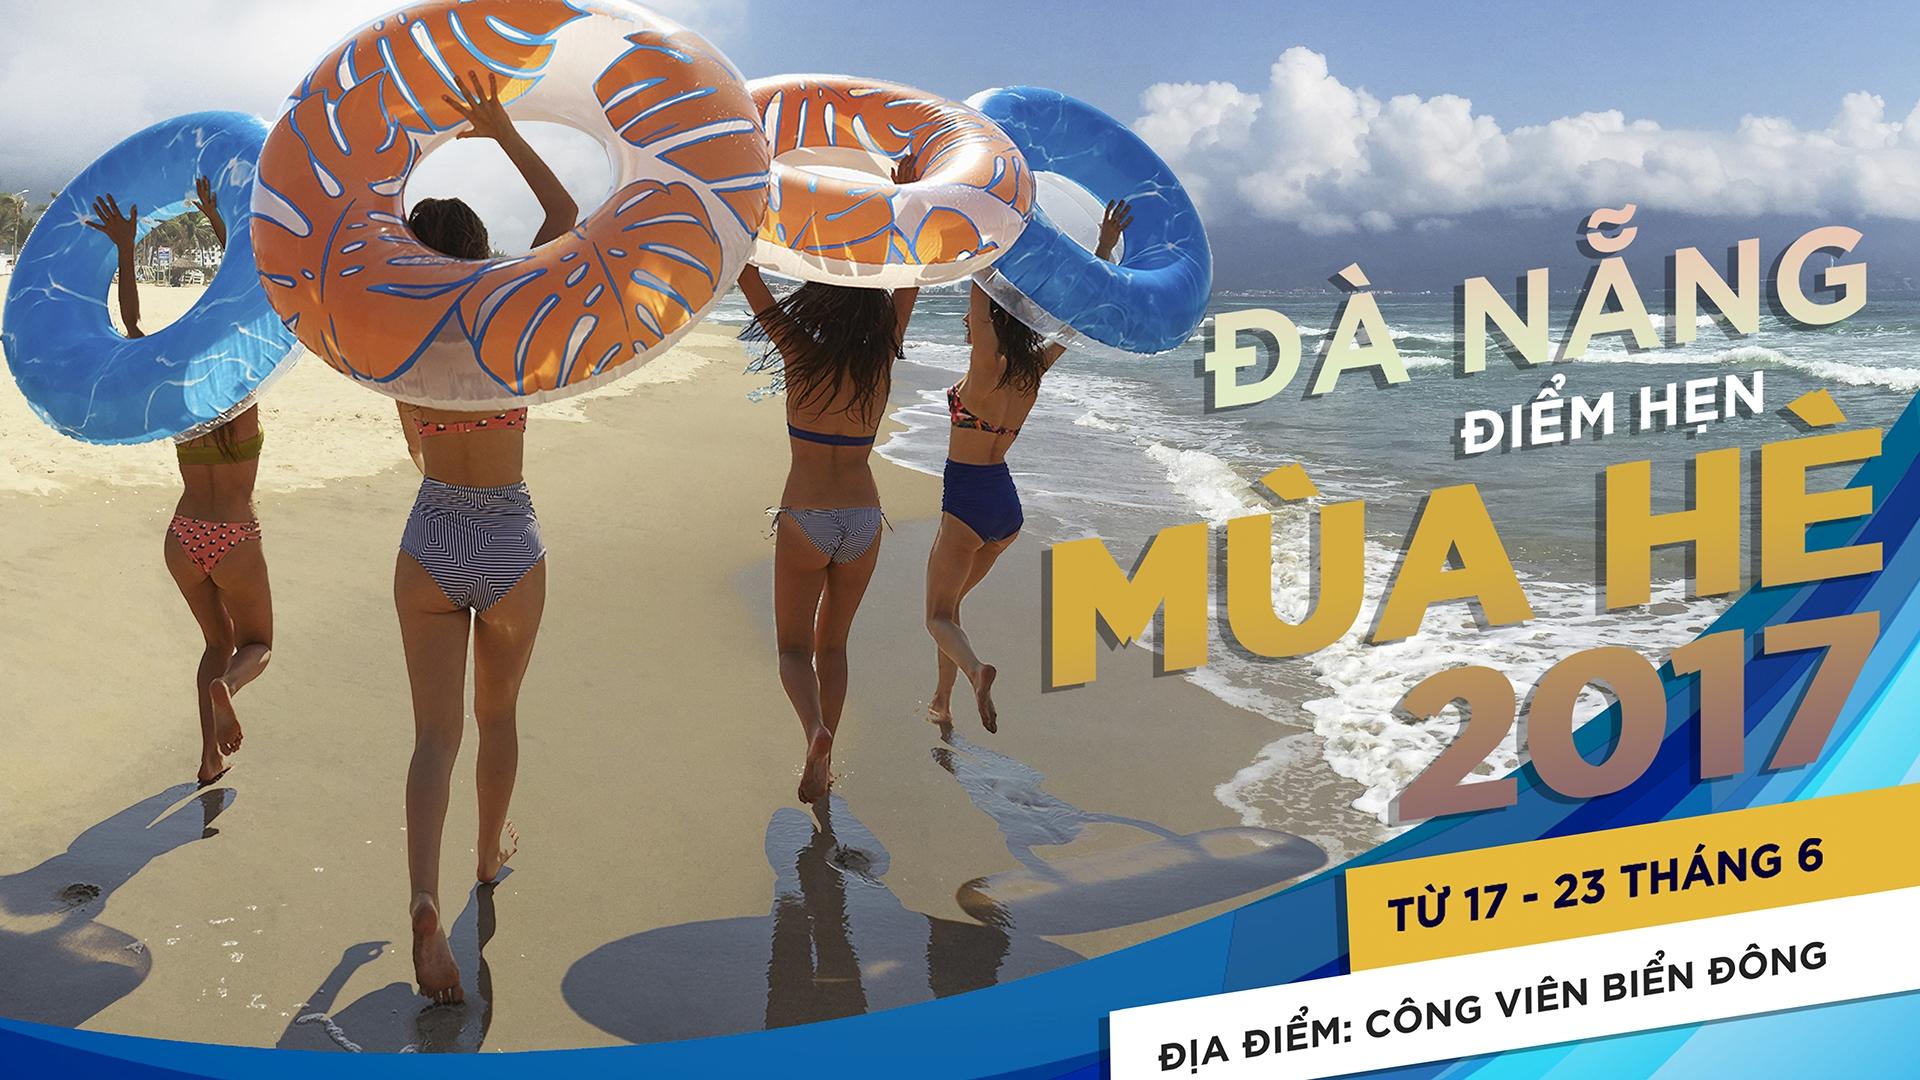 Danang Summer Destination 2017